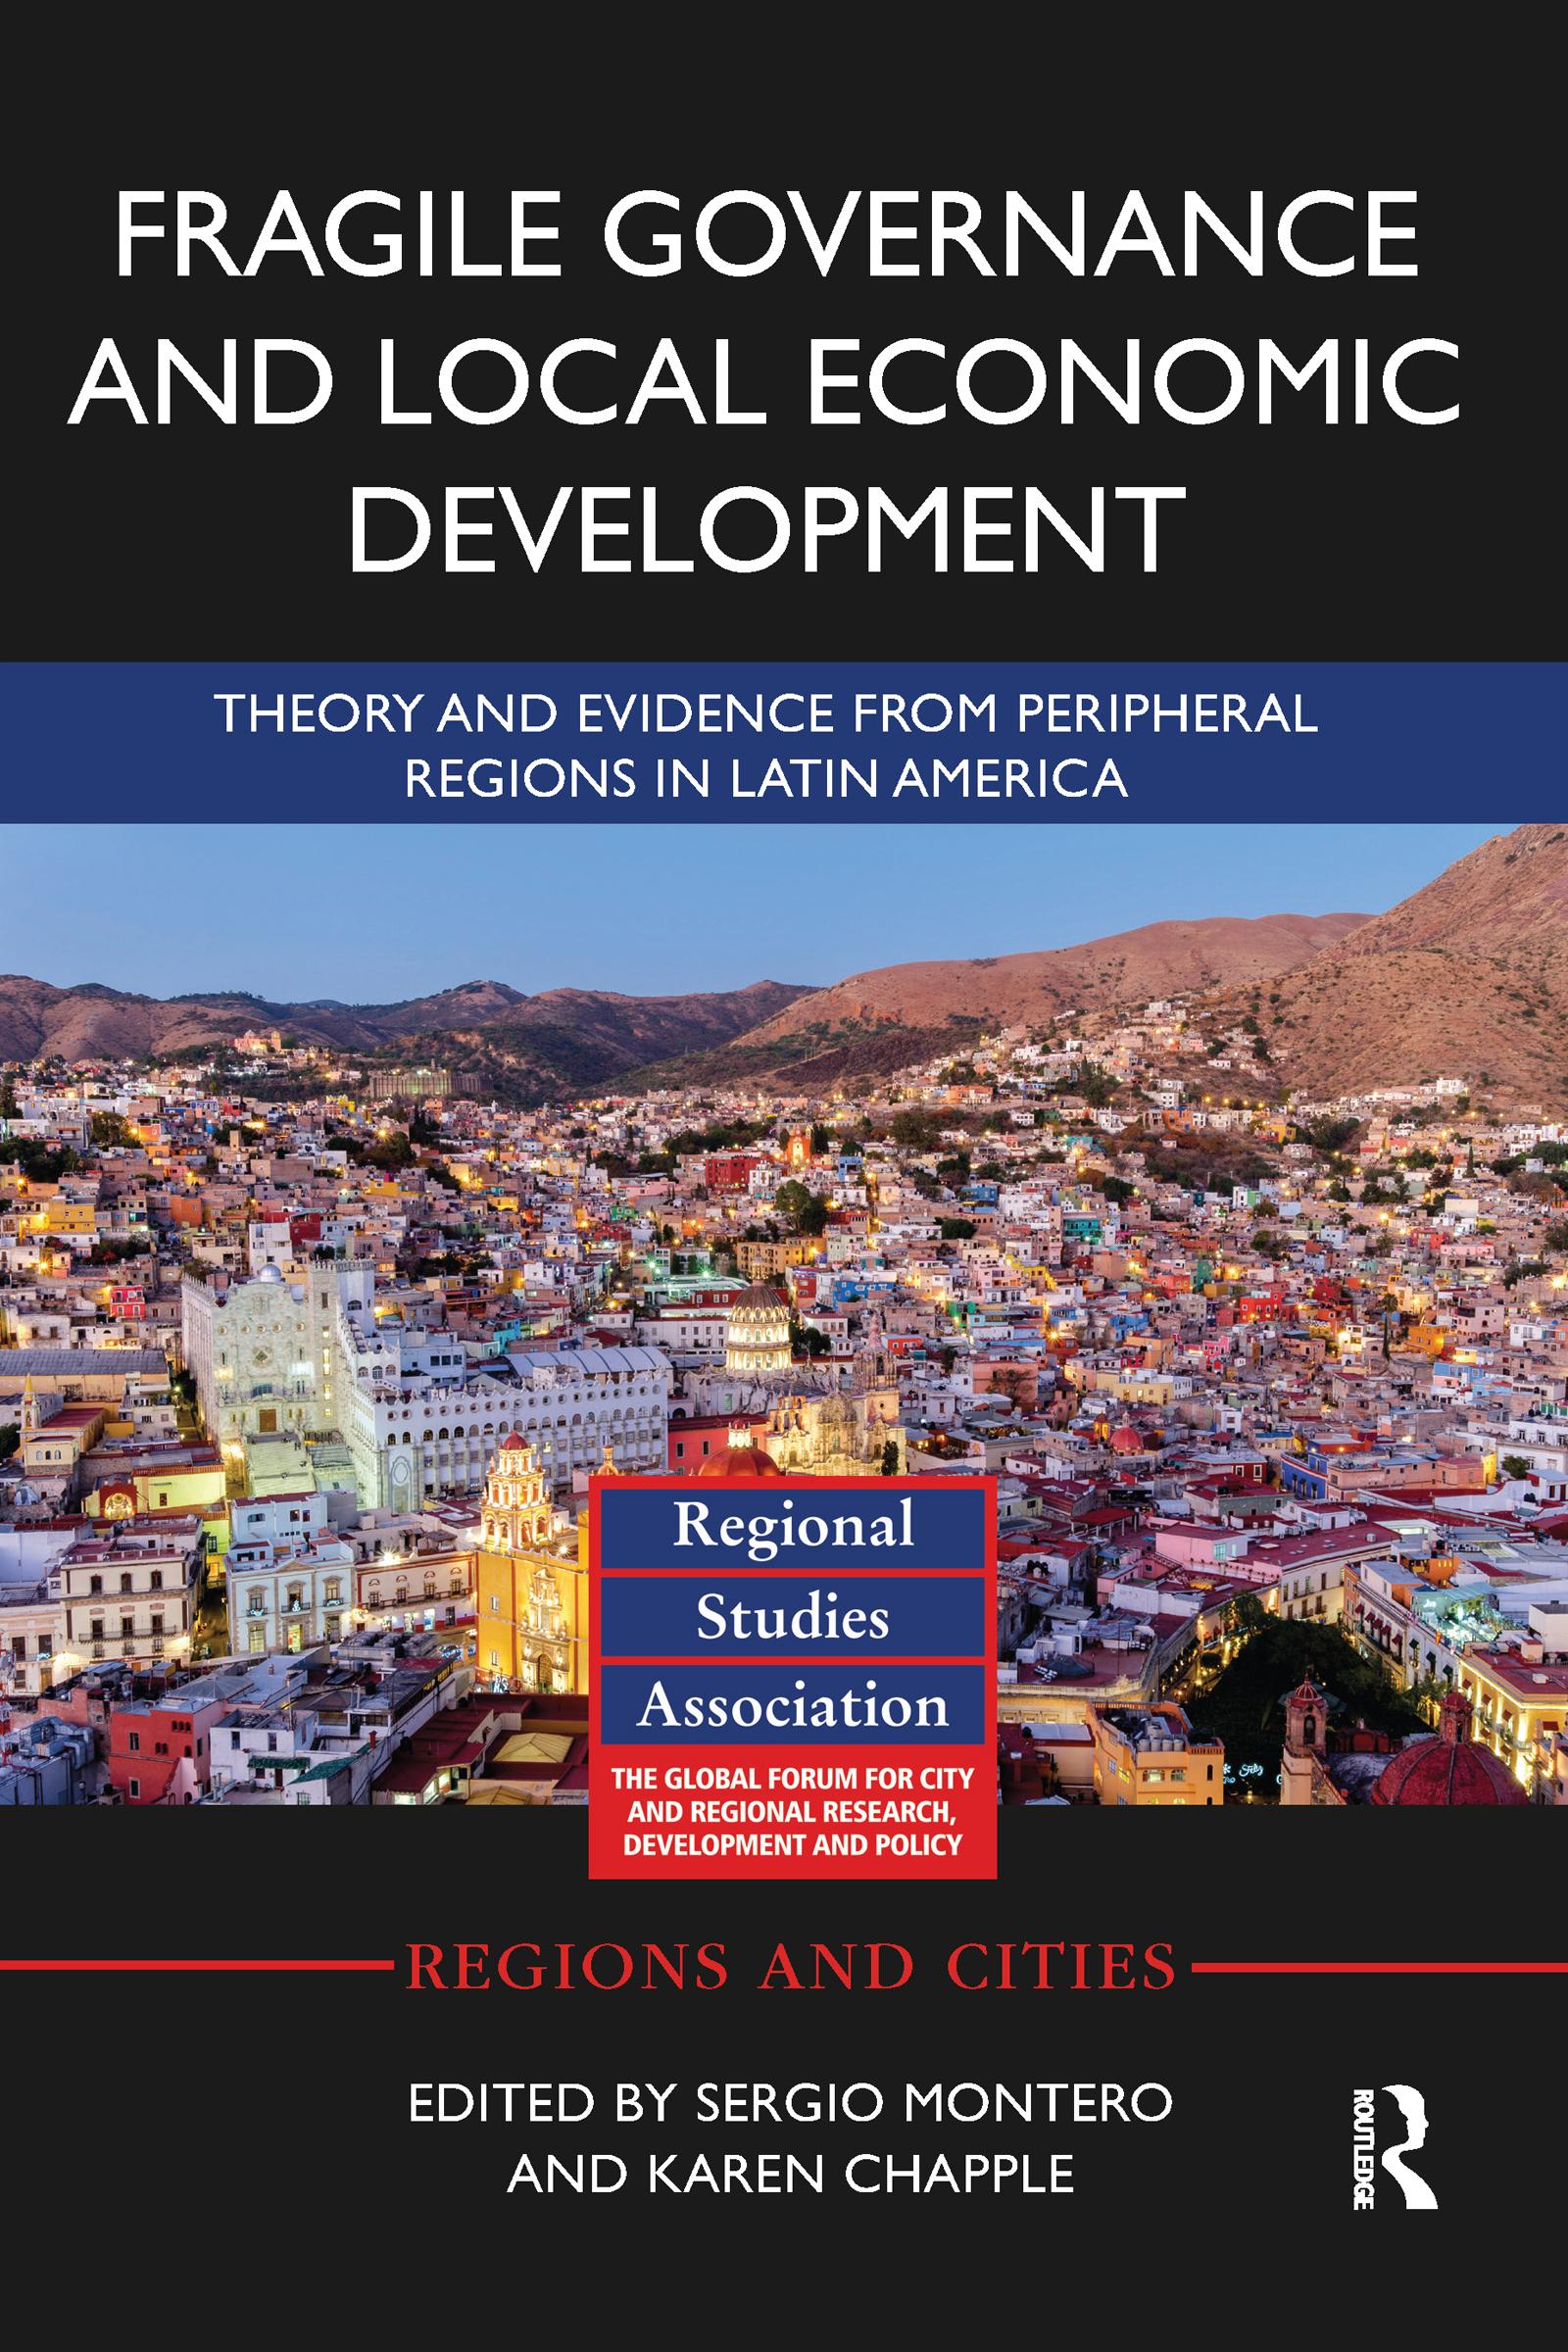 Fragile Governance and Local Economic Development